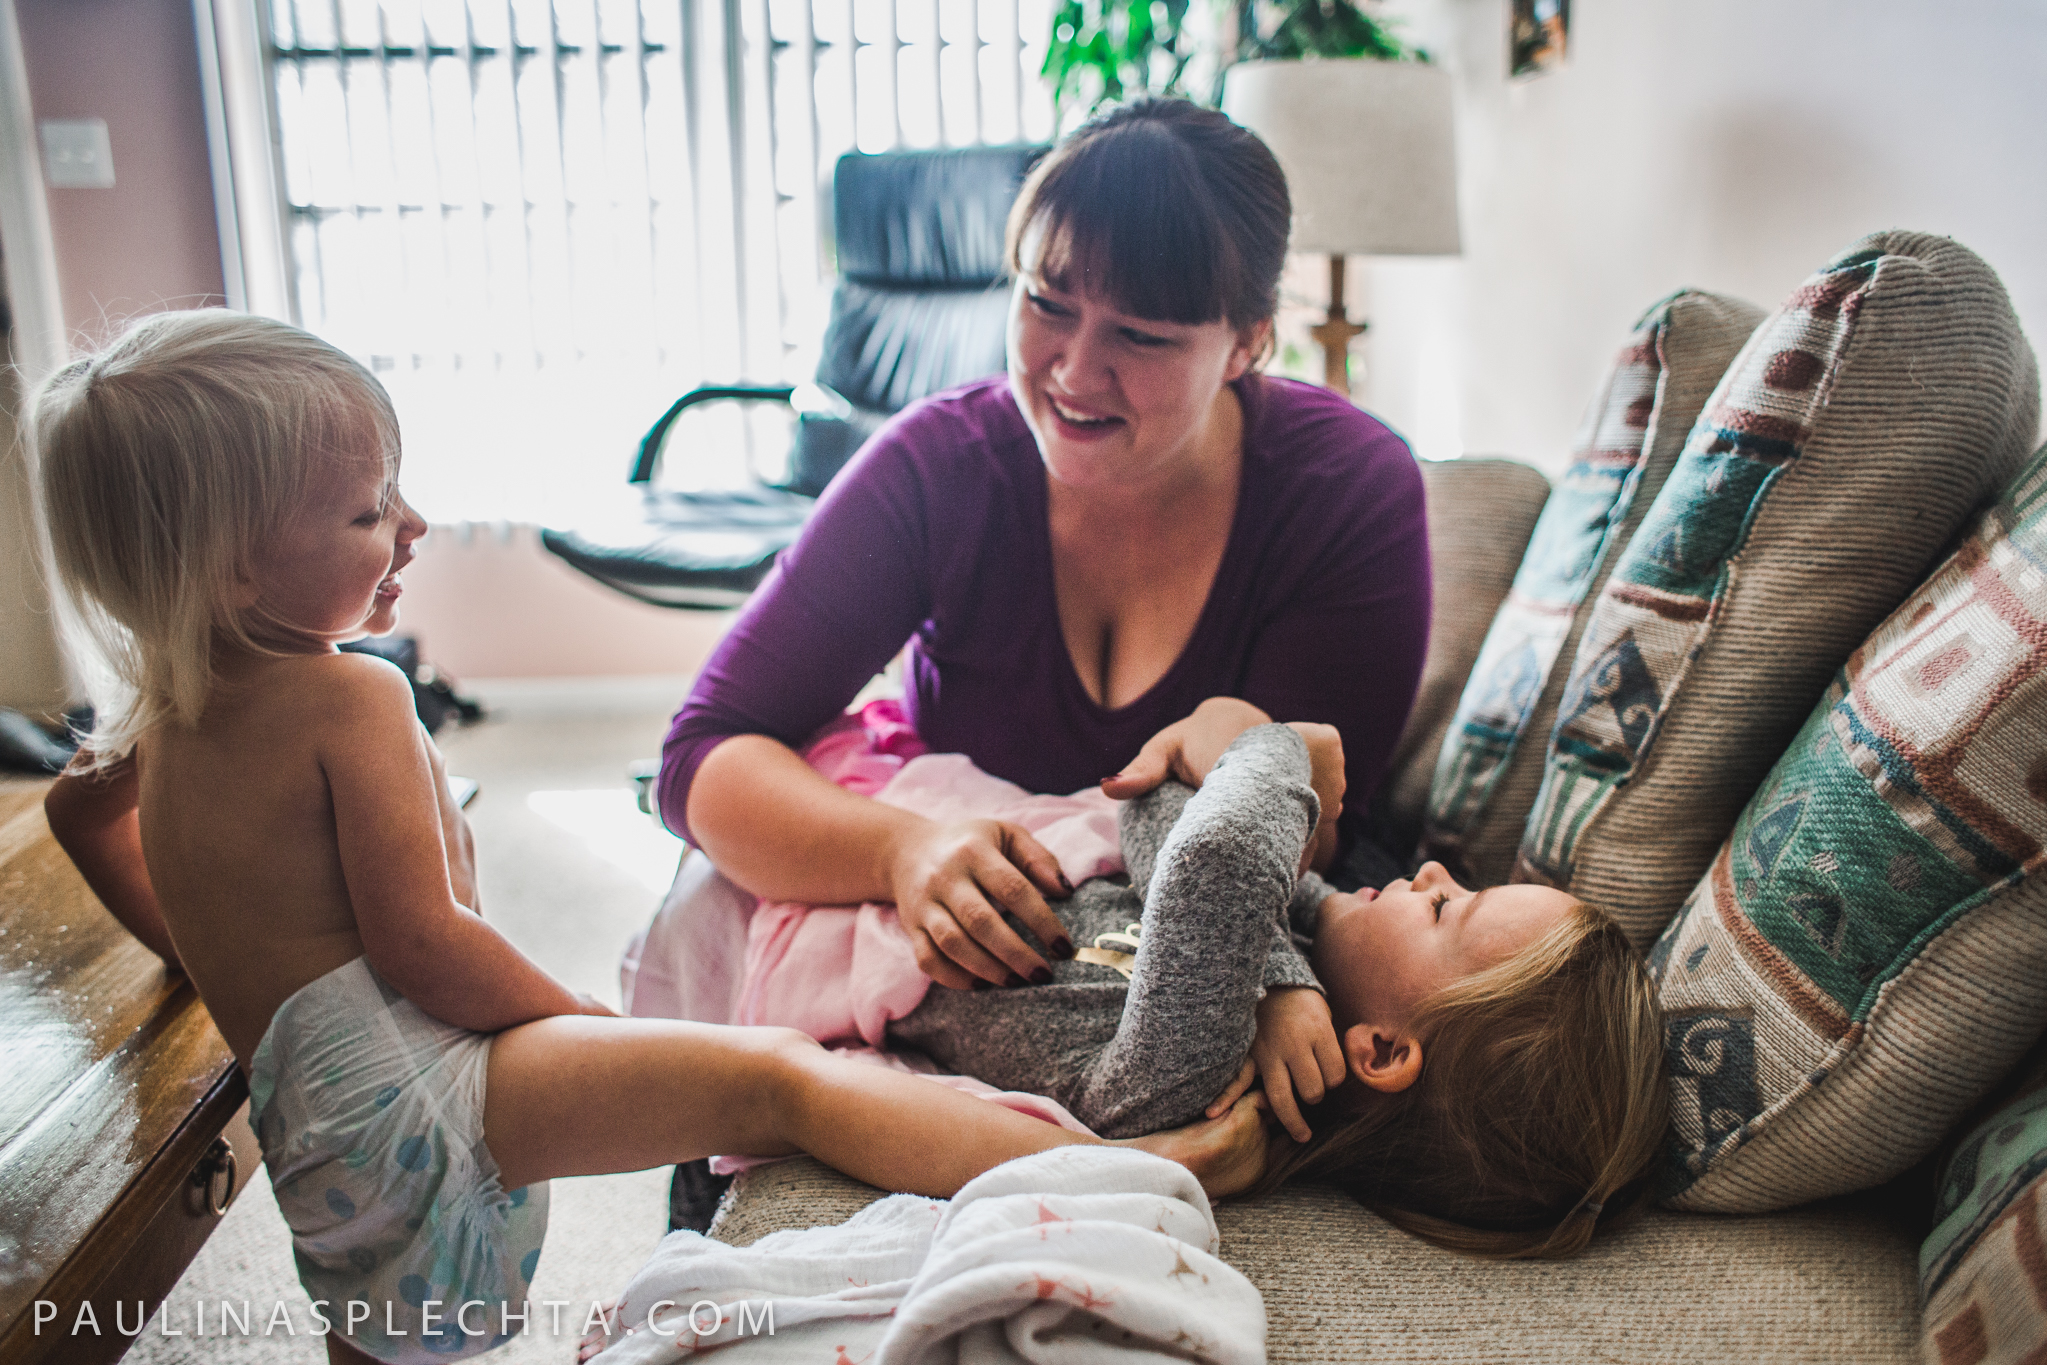 Family Photographer South Florida Pompano Broward Palm Beach Babies Baby Newborn Breastfeeding Birth Photograpy Beach Home Documentary Session-215.jpg